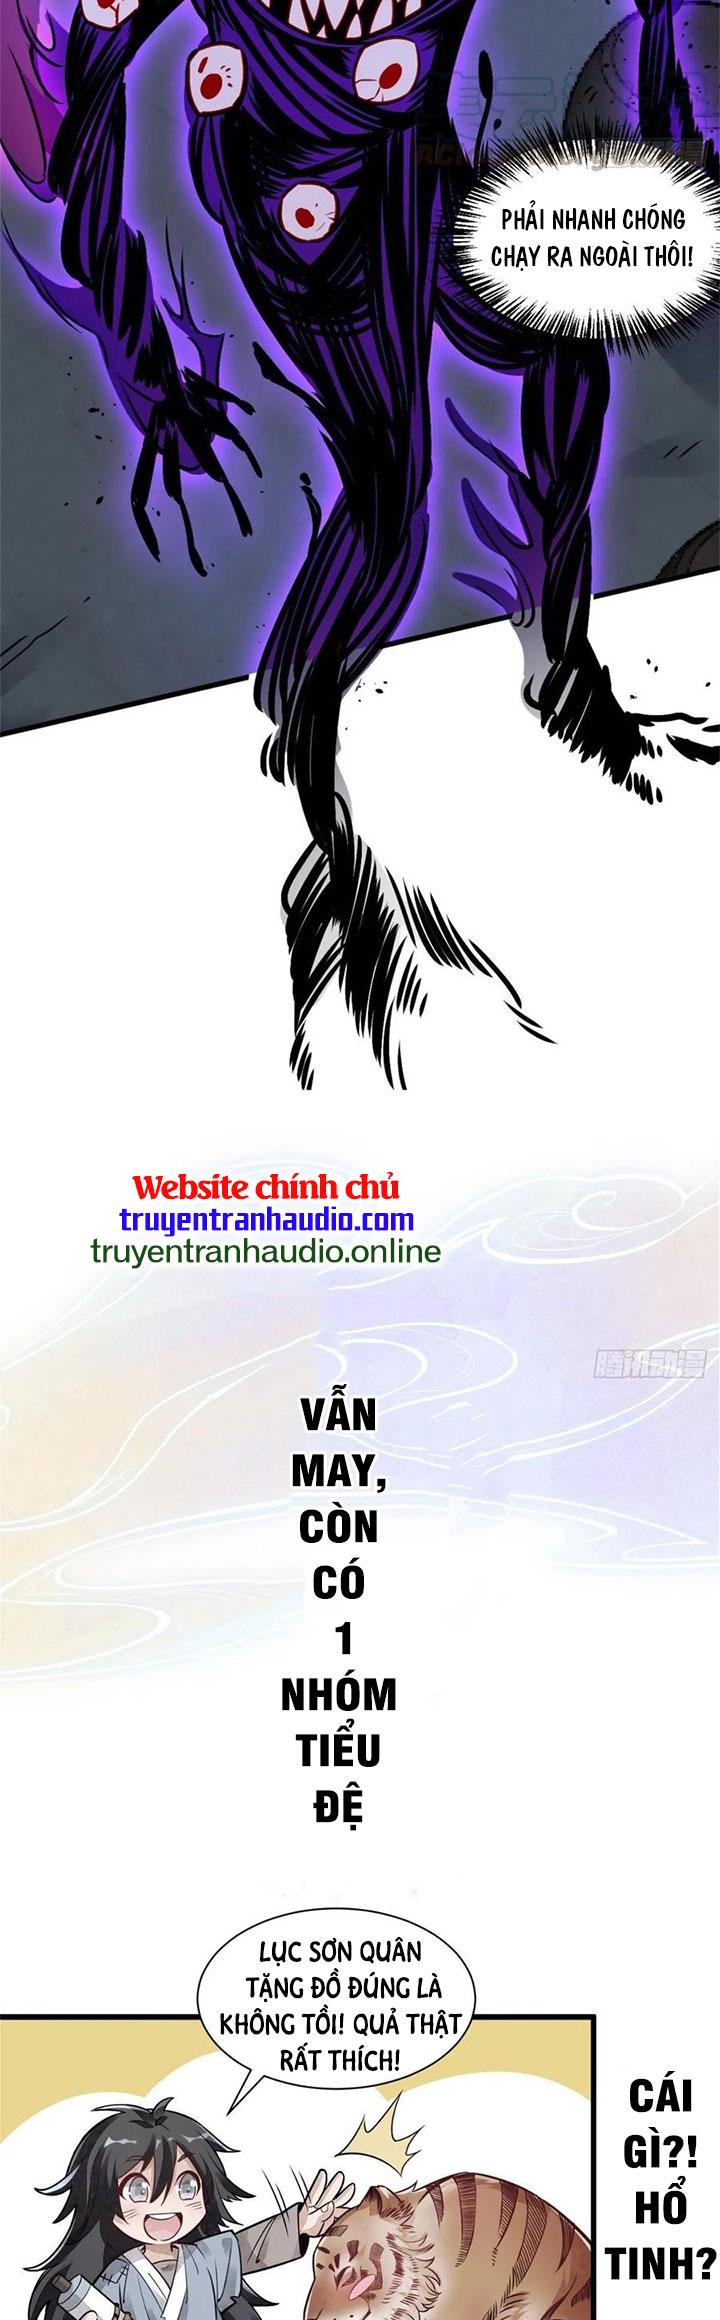 Lạn Kha Kỳ Duyên Chapter 0 - upload bởi SayTruyen.Net